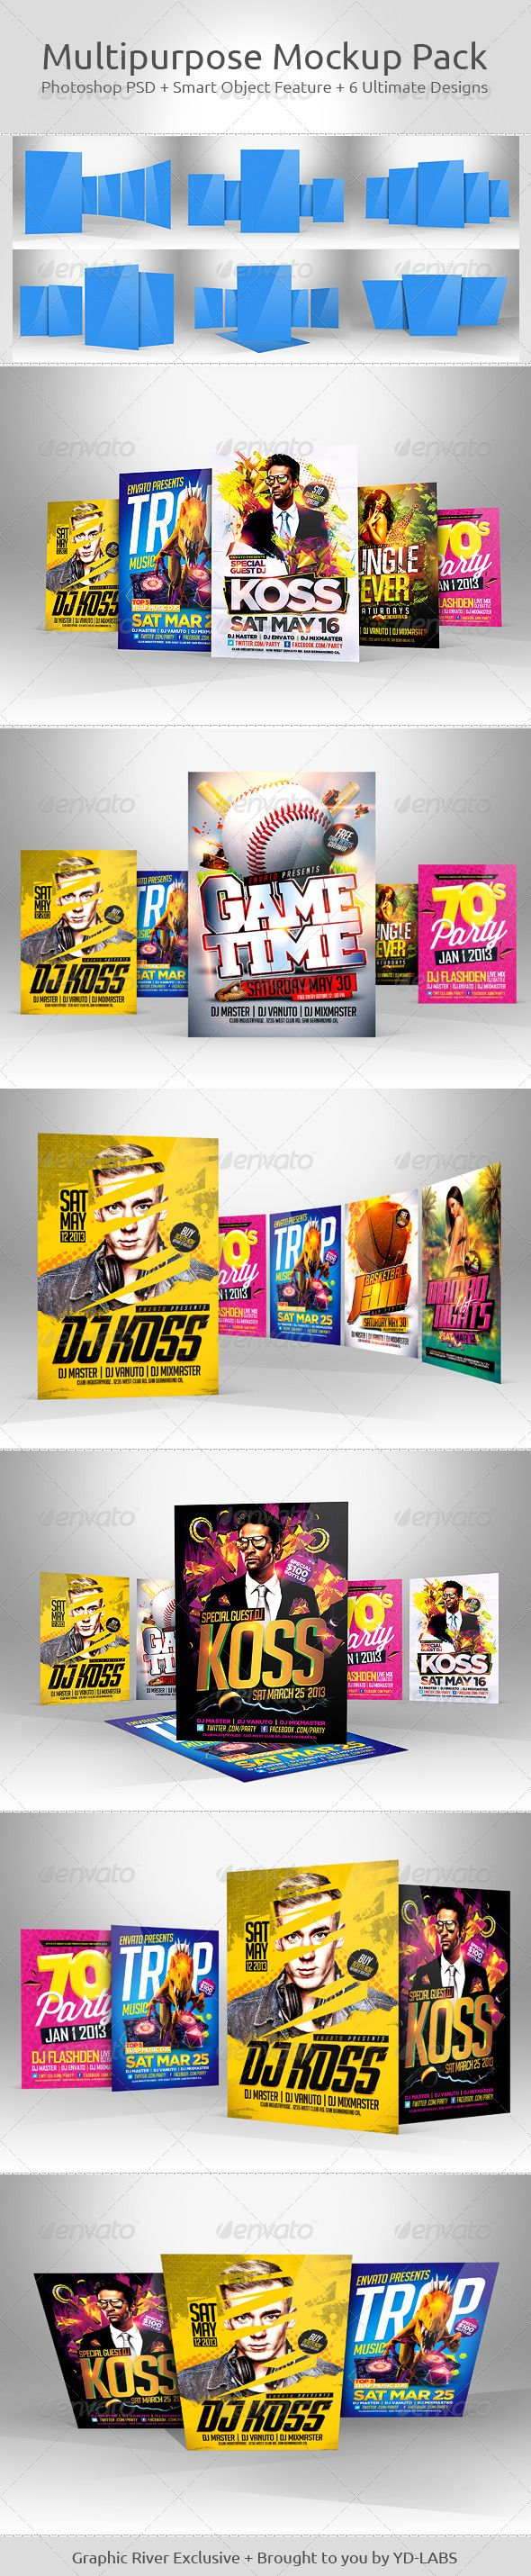 6 poster design photo mockups - Multipurpose Mockup Pack 5